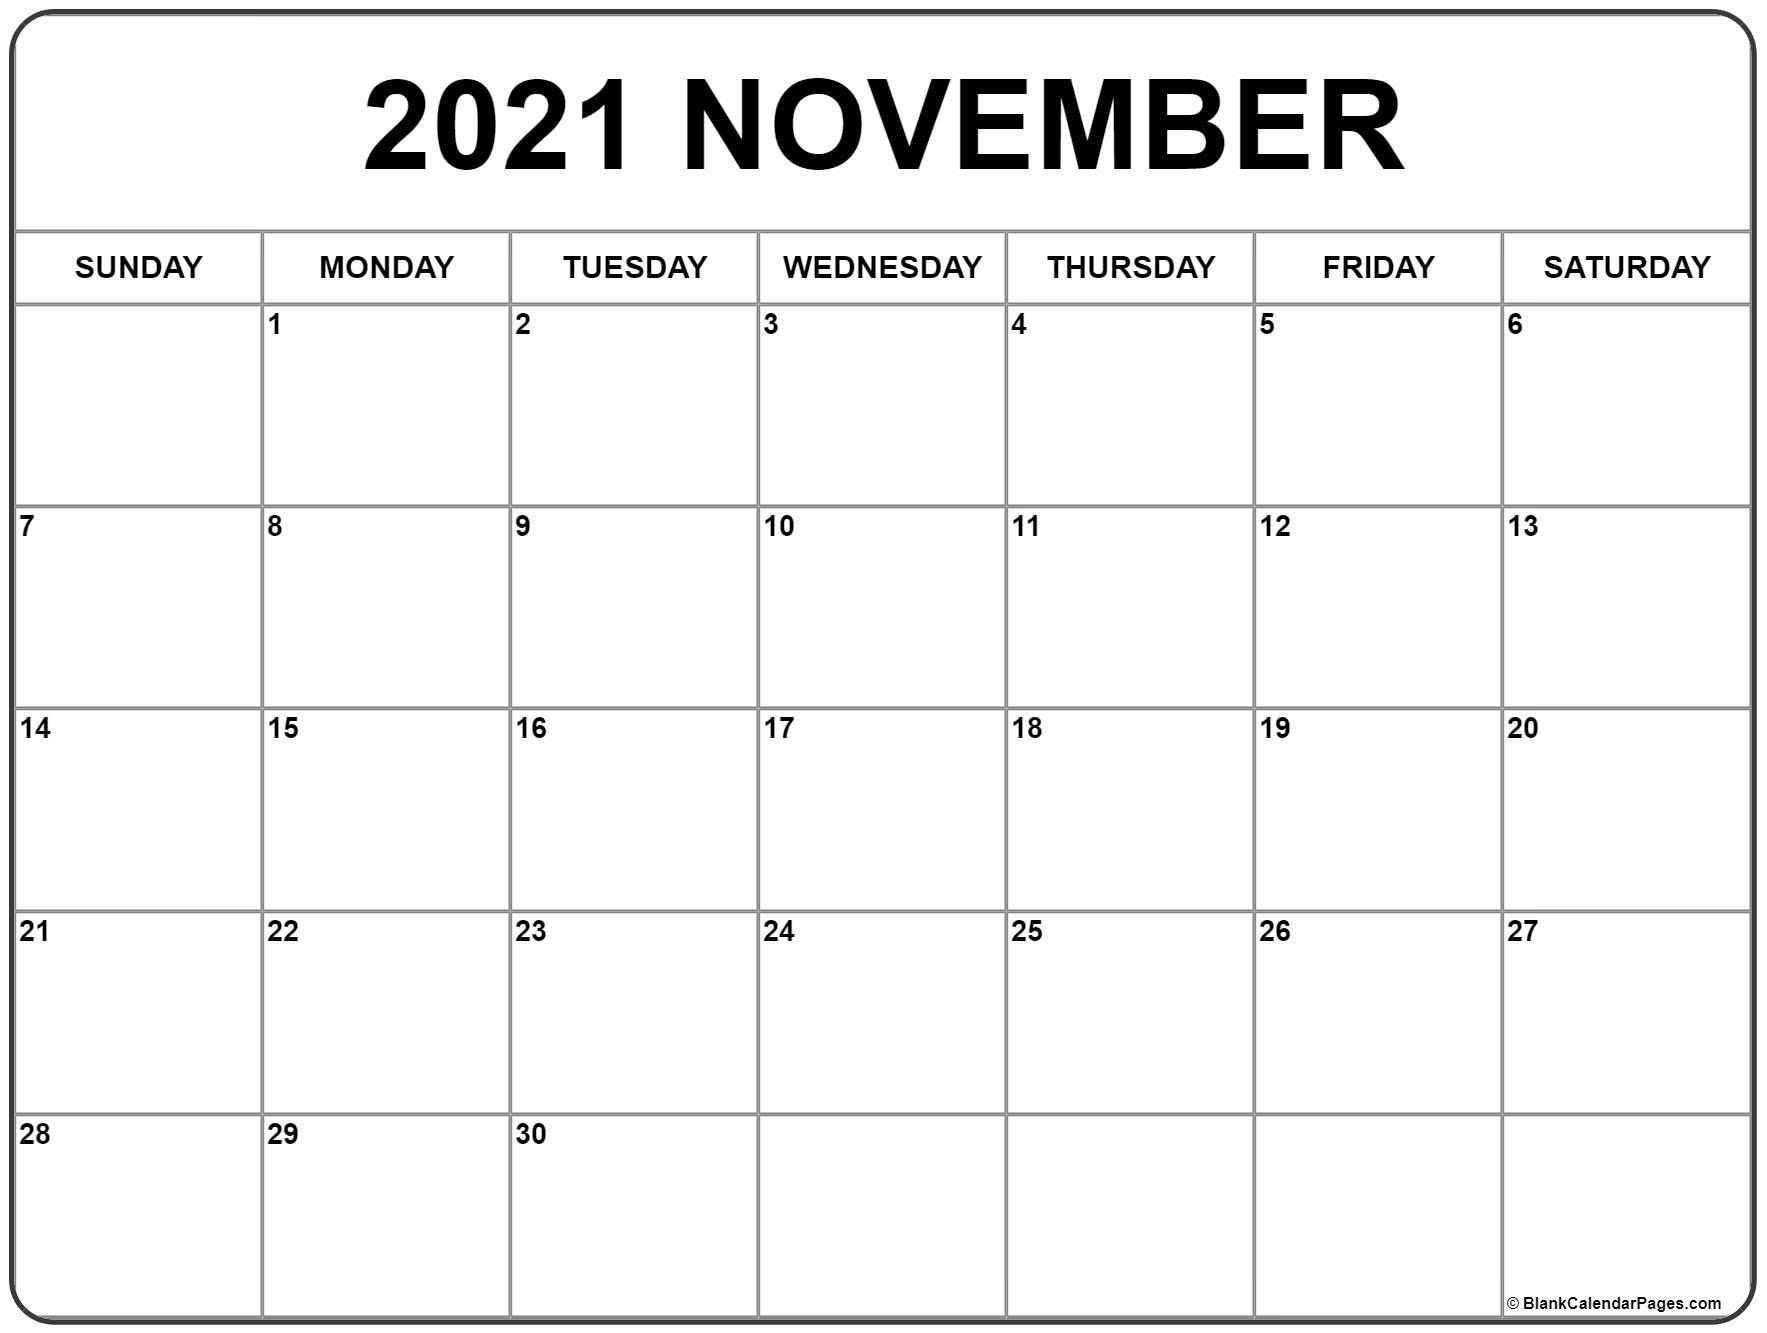 Get Printable November 2021 Calendar